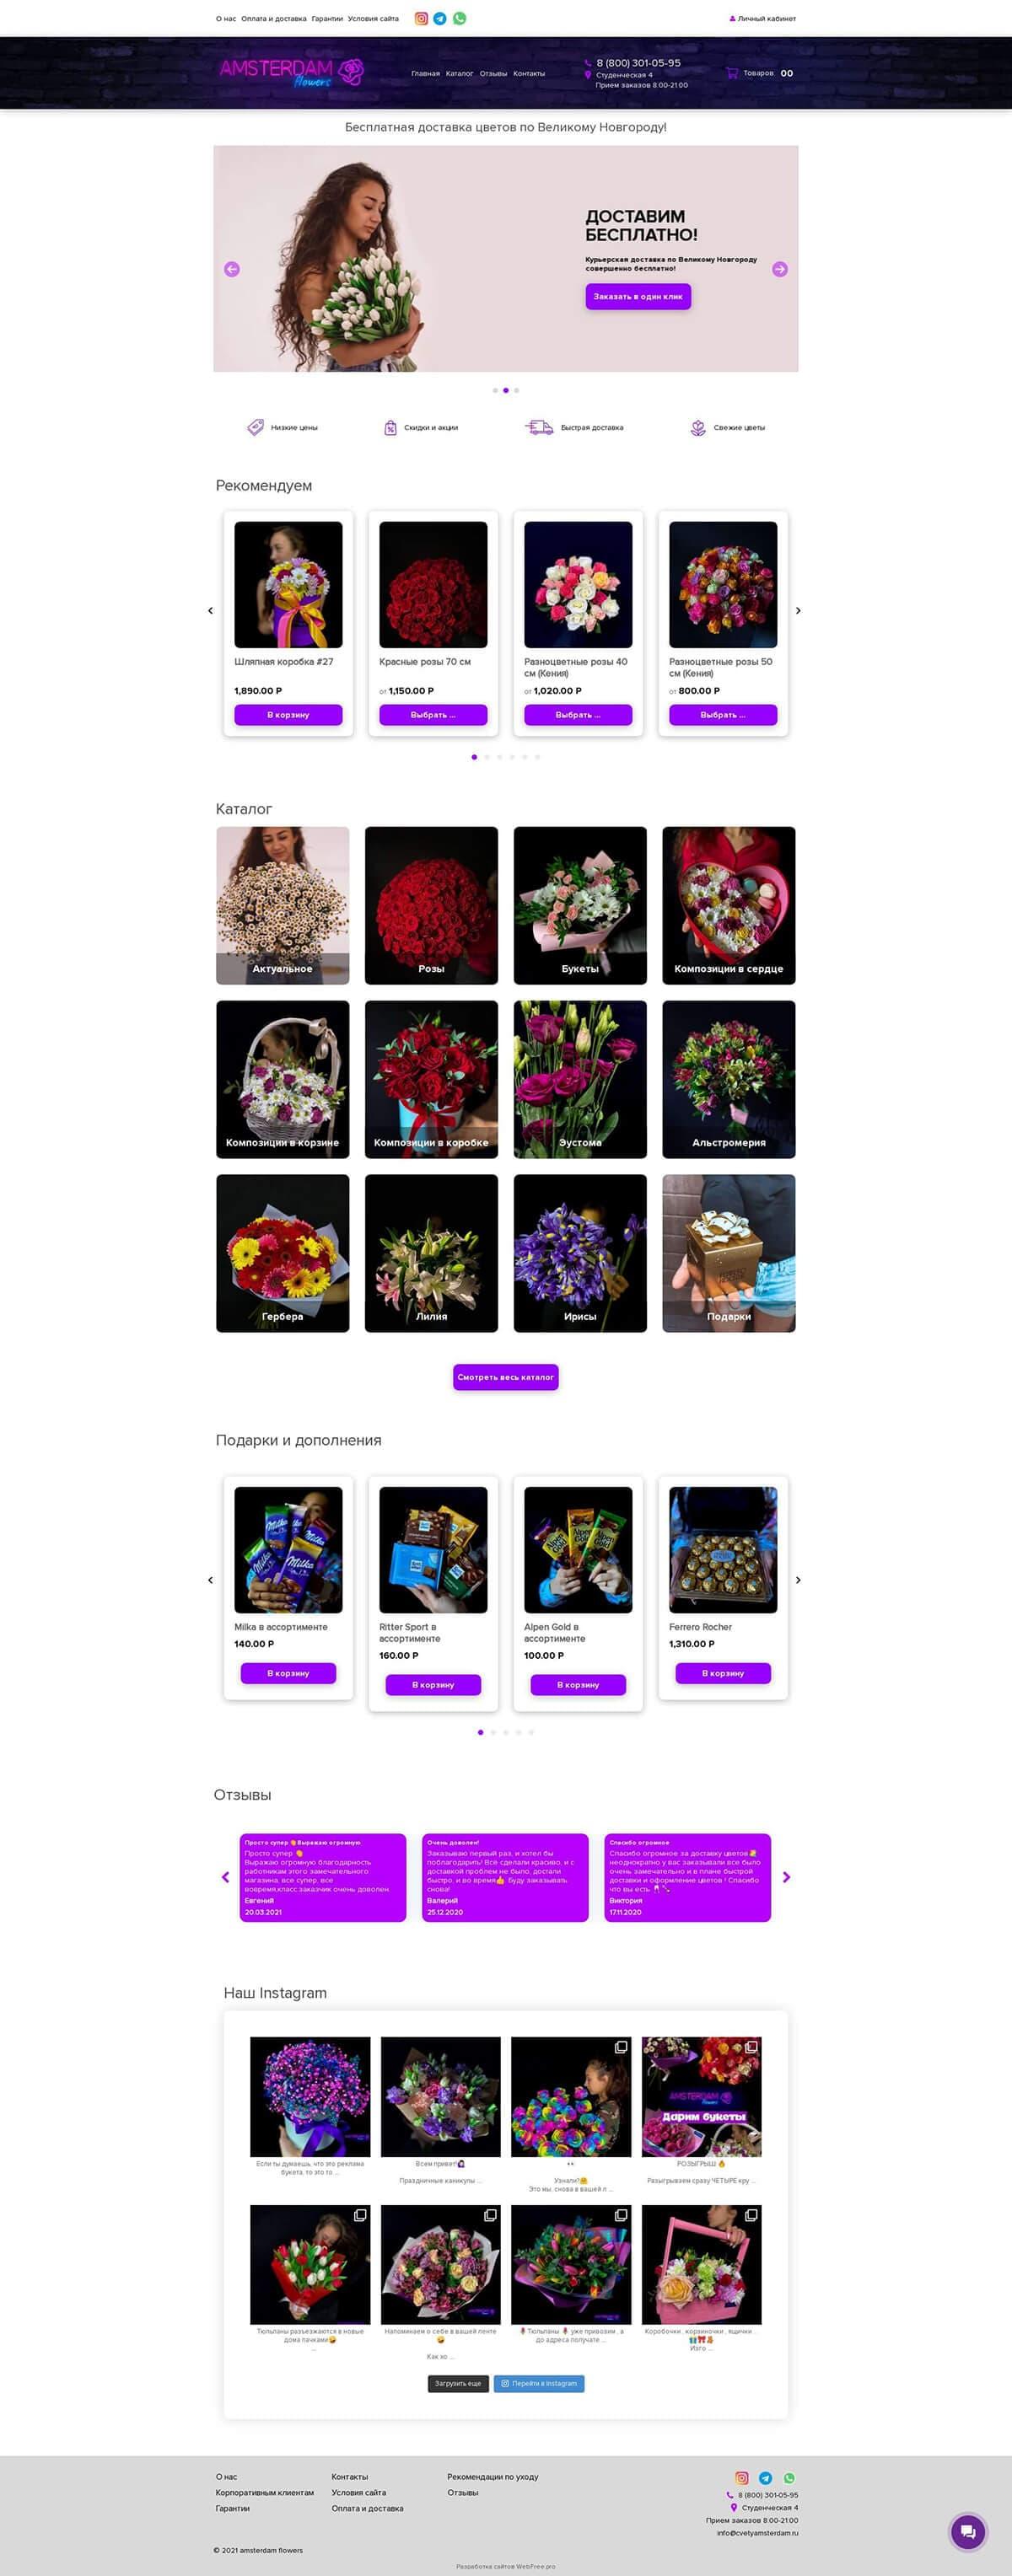 Магазин доставки цветов «AmsterdamFlowers»